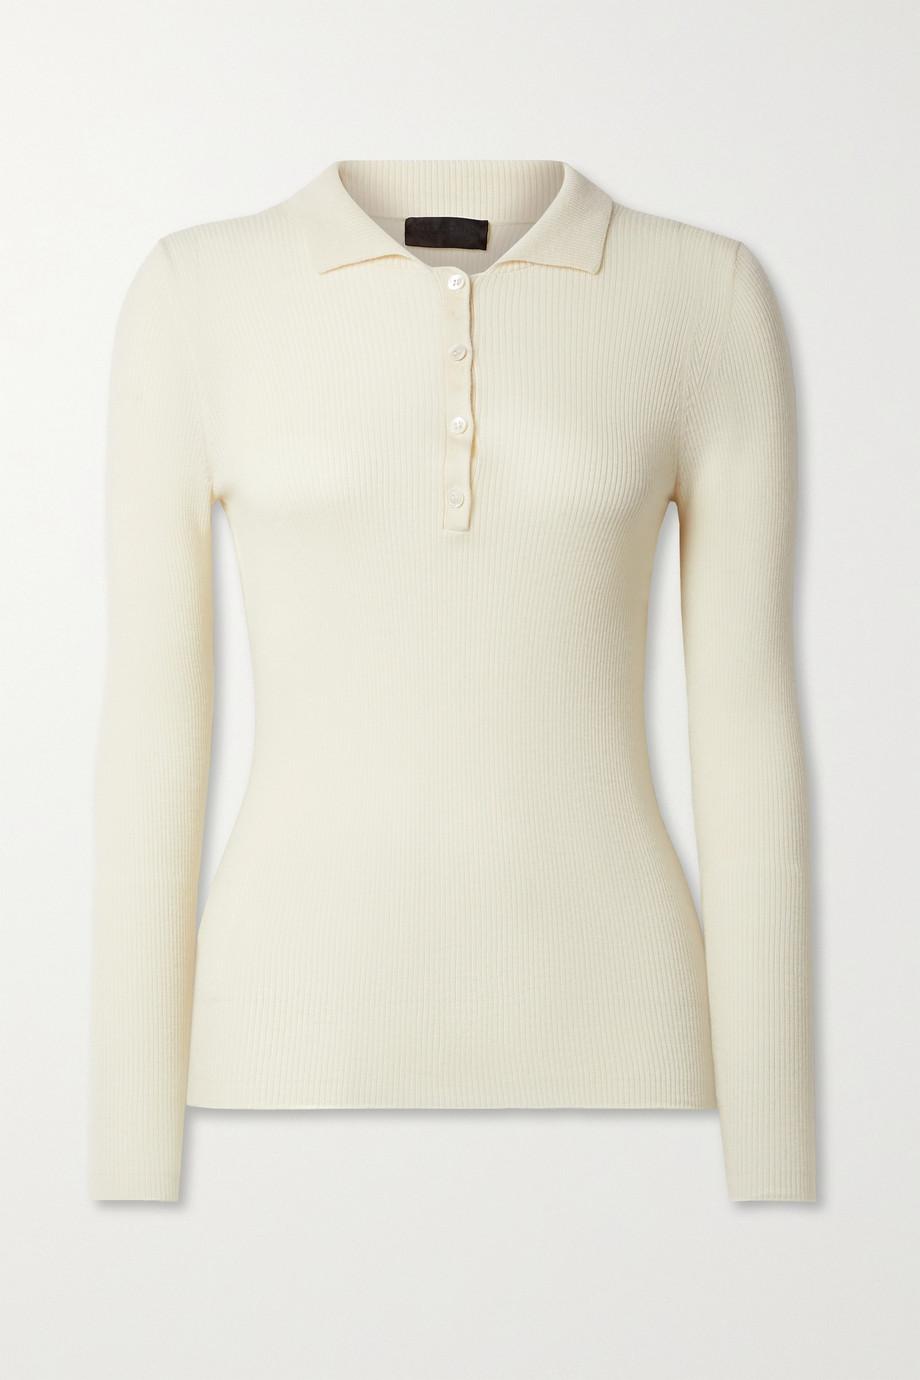 Nili Lotan Daisy ribbed merino wool, silk and cashmere-blend sweater